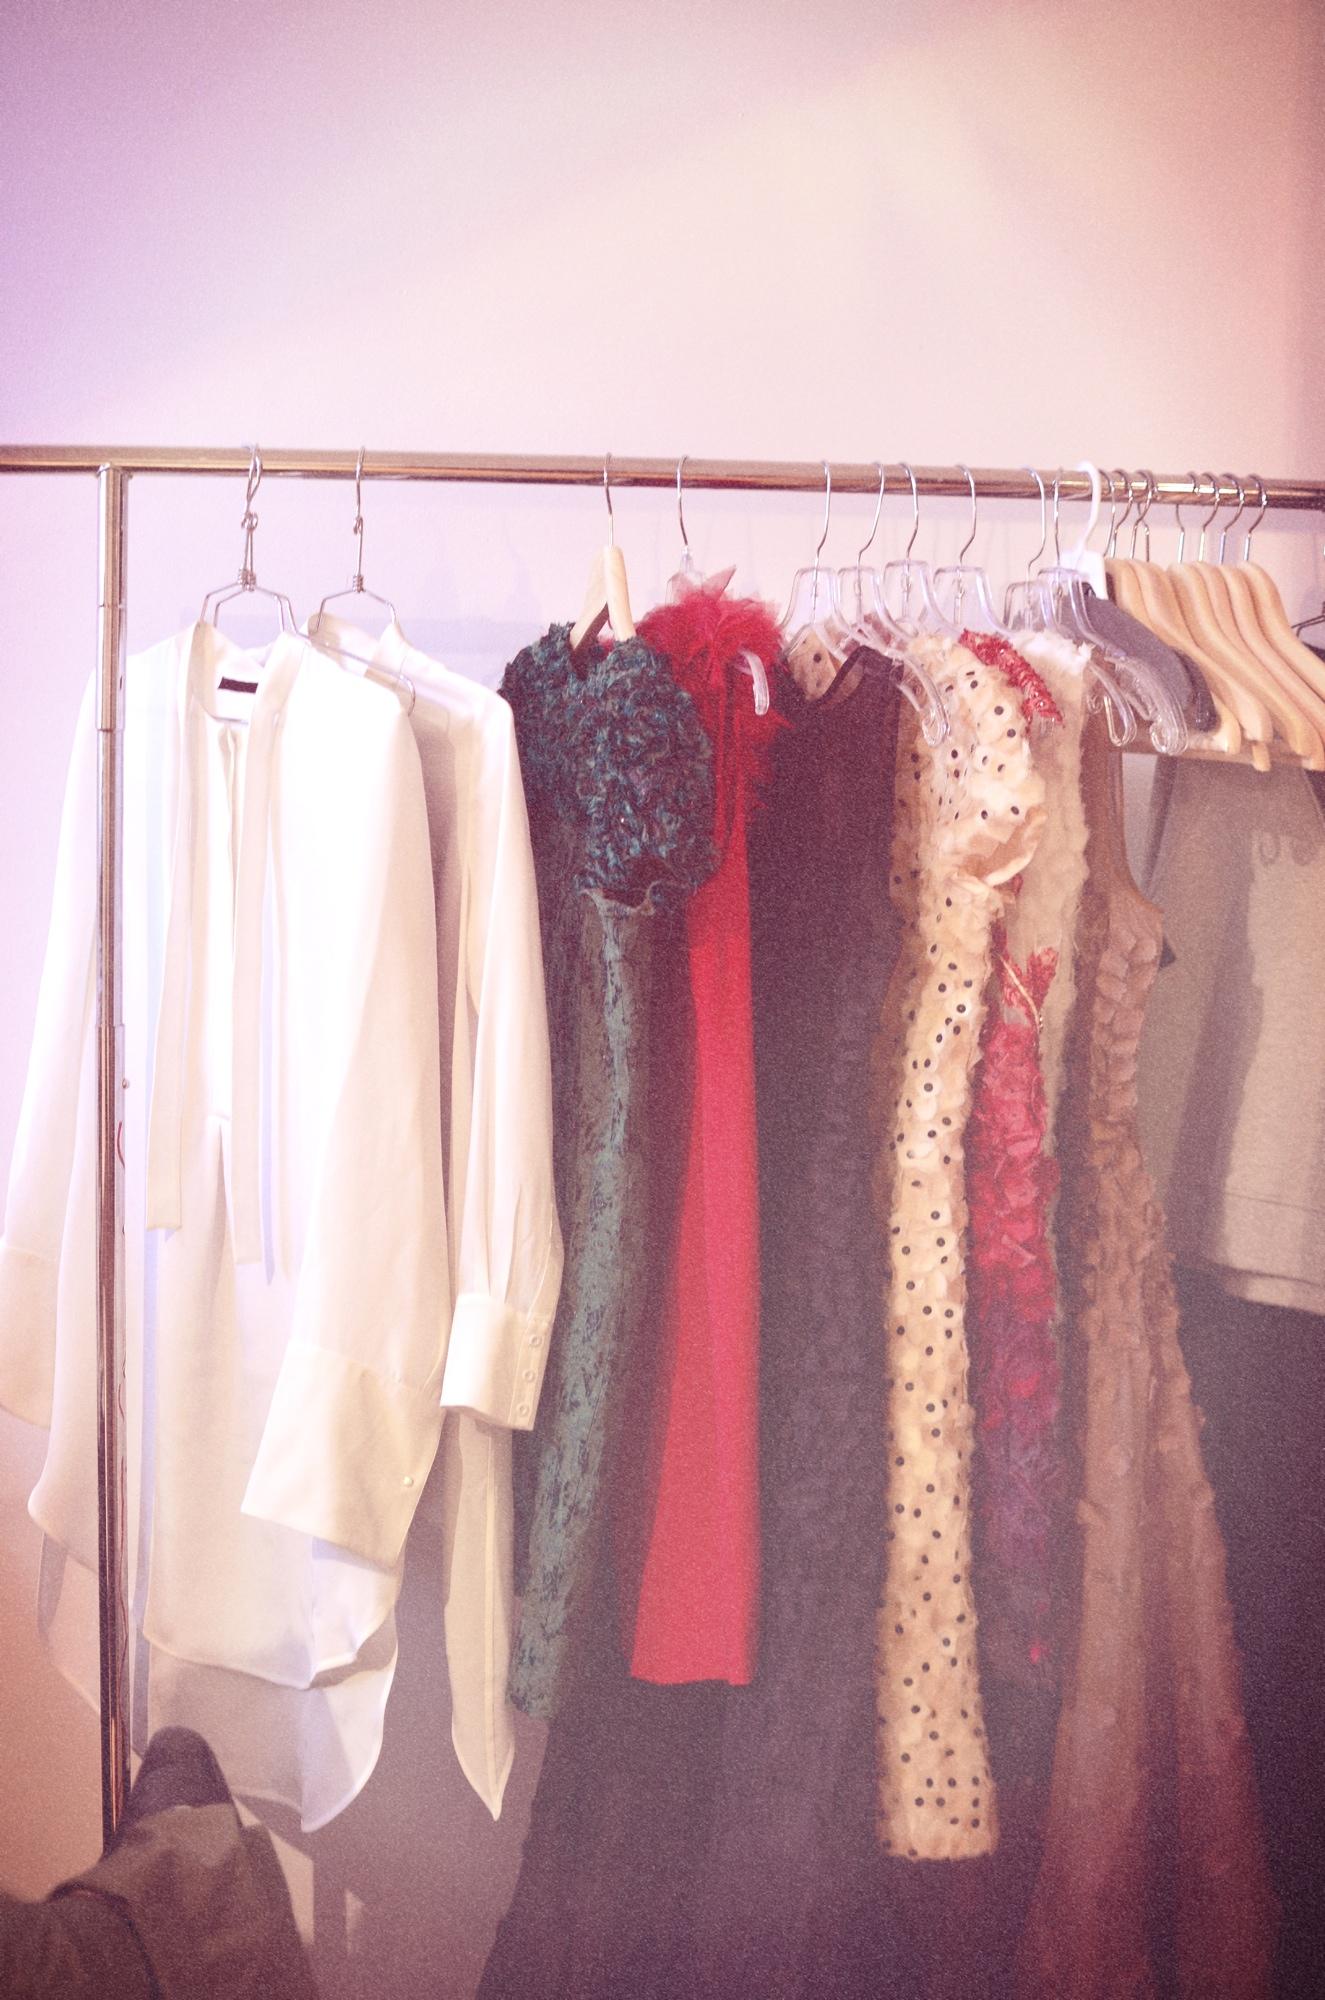 Photoshoot - clothes rack.jpg